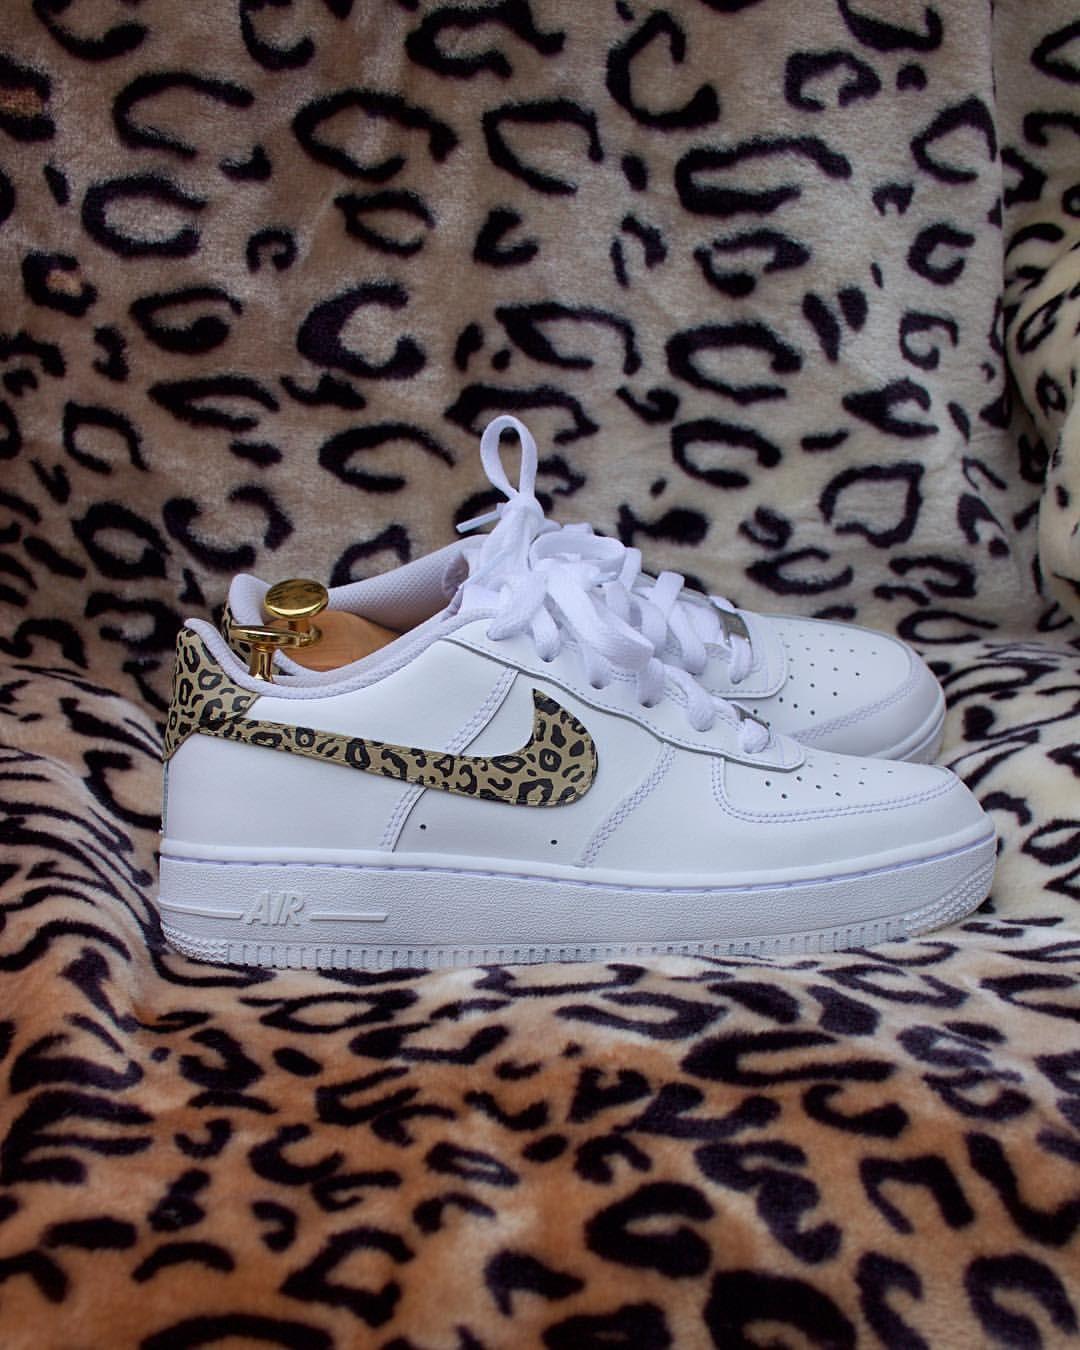 16+ Nike animal print shoes ideas info